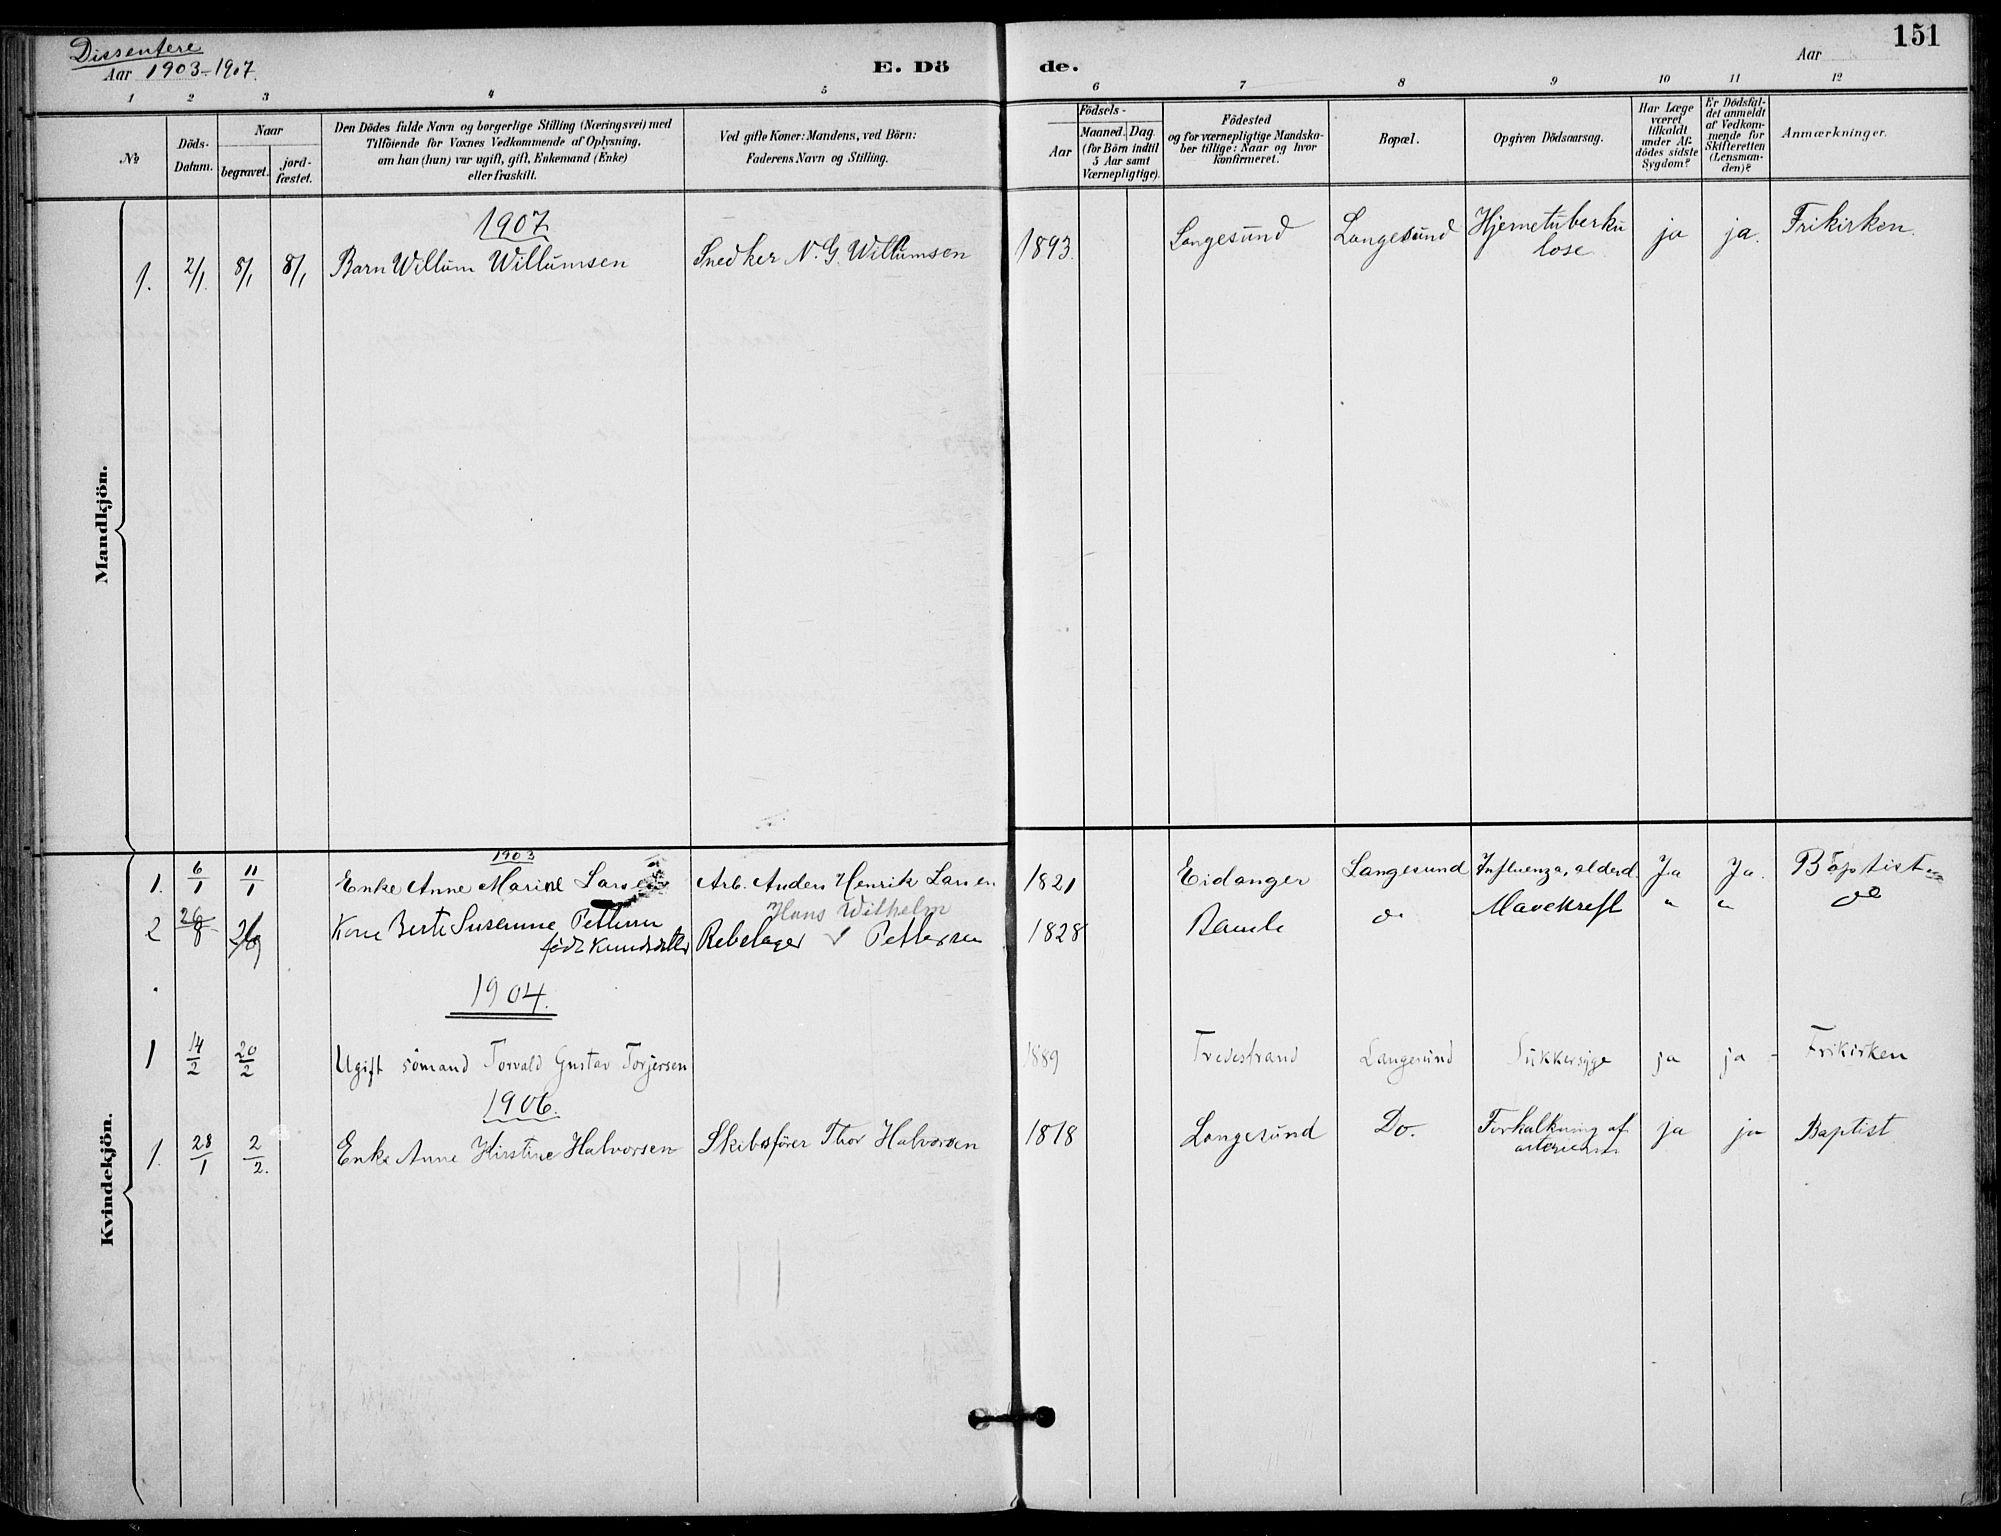 SAKO, Langesund kirkebøker, F/Fa/L0003: Ministerialbok nr. 3, 1893-1907, s. 151